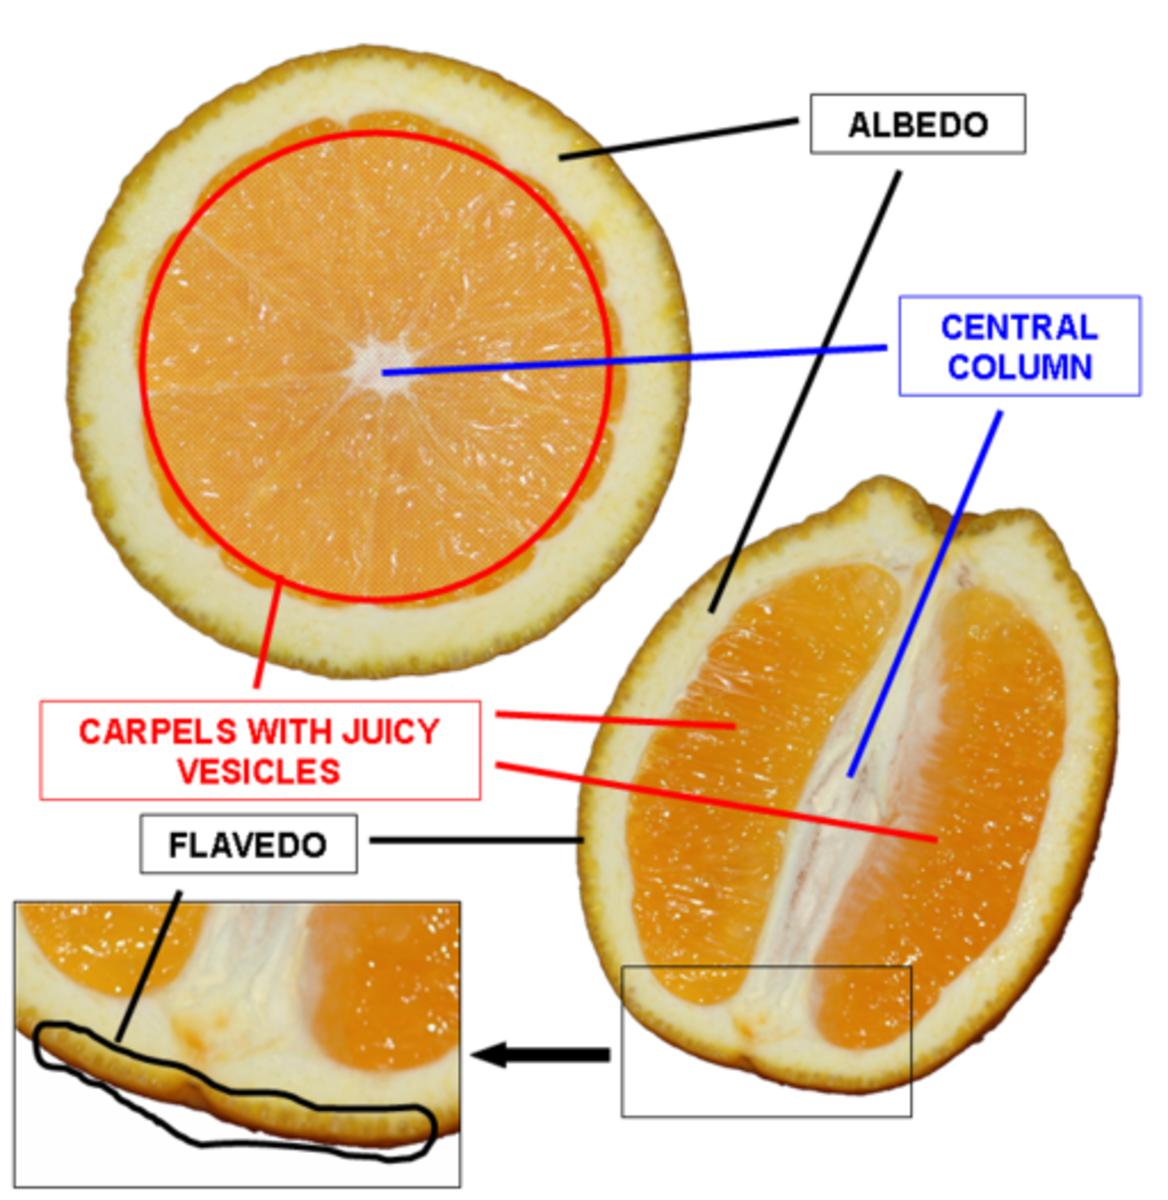 Inside the orange fruit